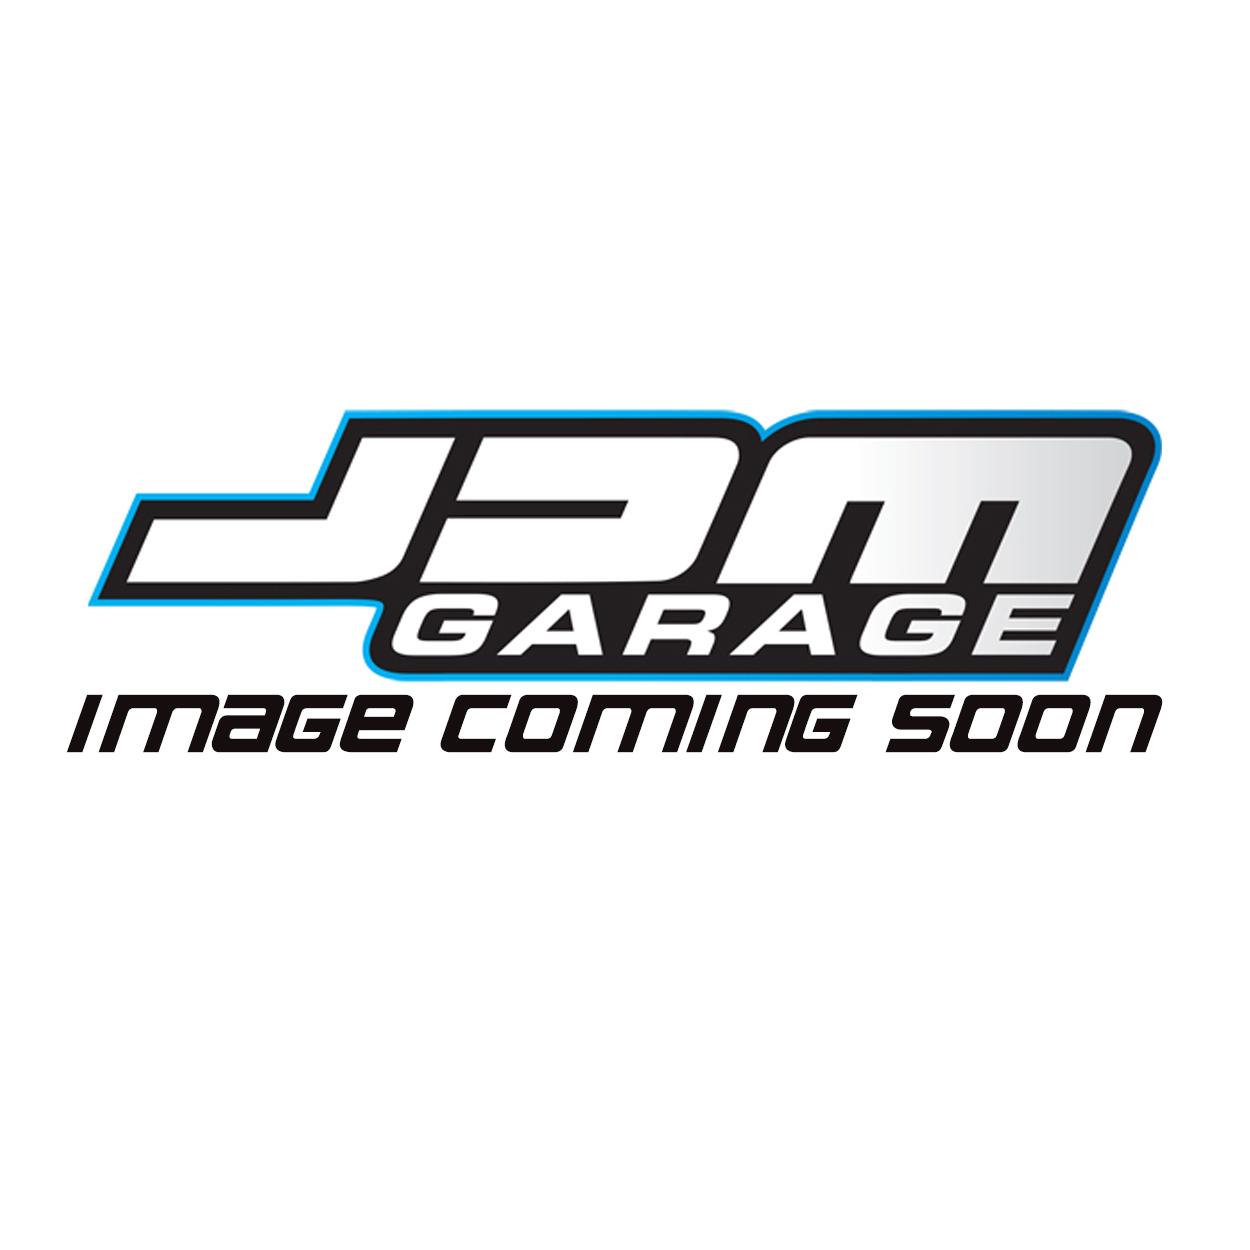 Siruda Exhaust Manifold Head Studs And MLS Gasket - Nissan Silvia S13 180SX / S14 200SX / S15 SR20DE SR20DET